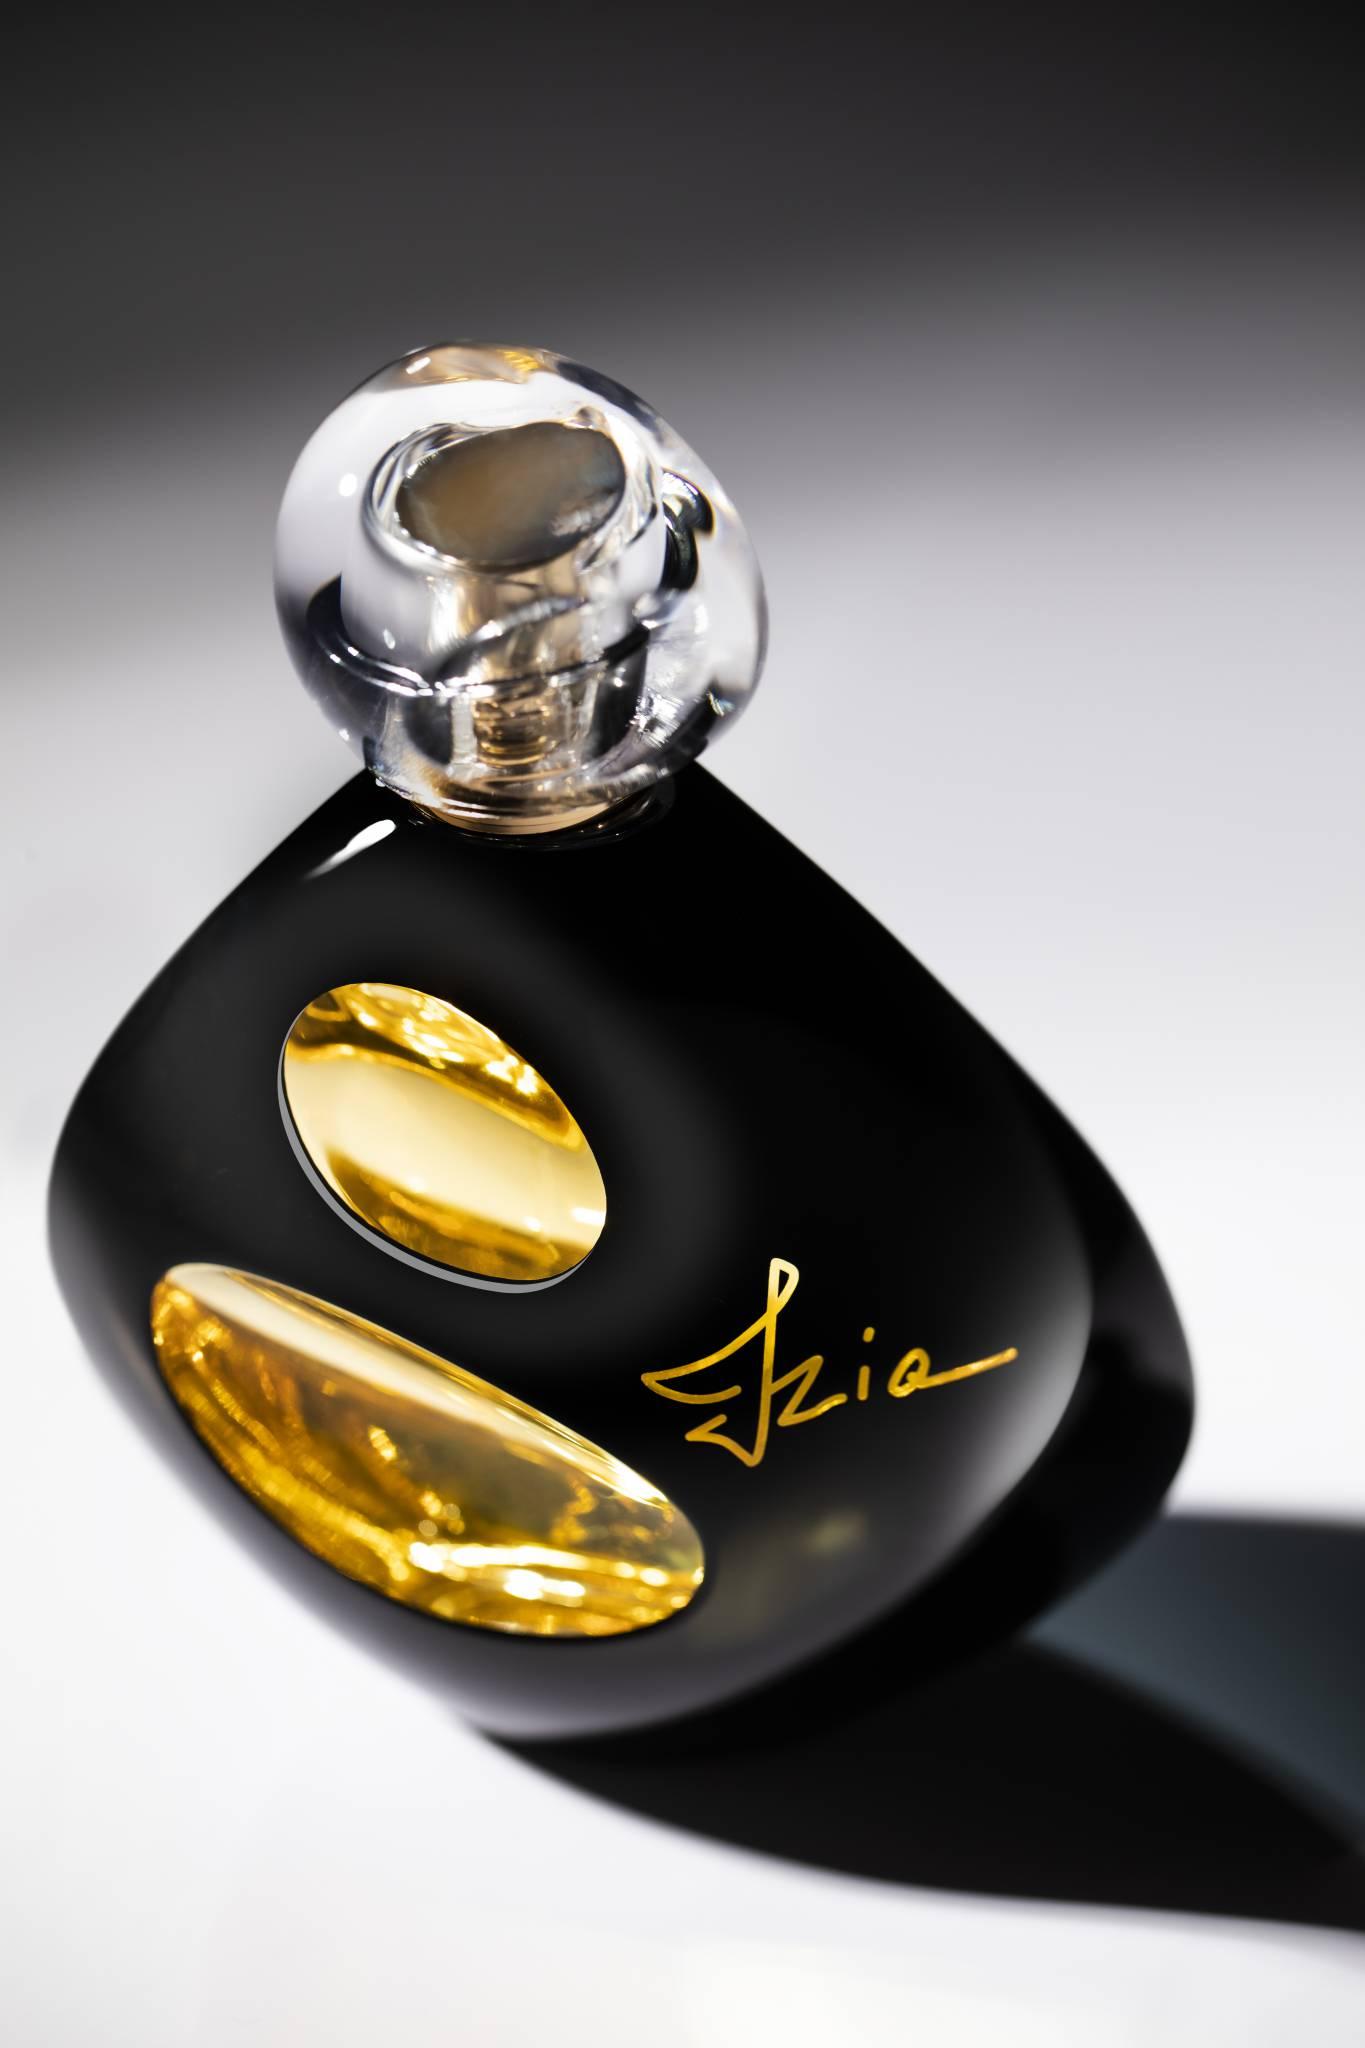 Sisley, Izia La Nuit - intensywny, bogaty zapach nocy